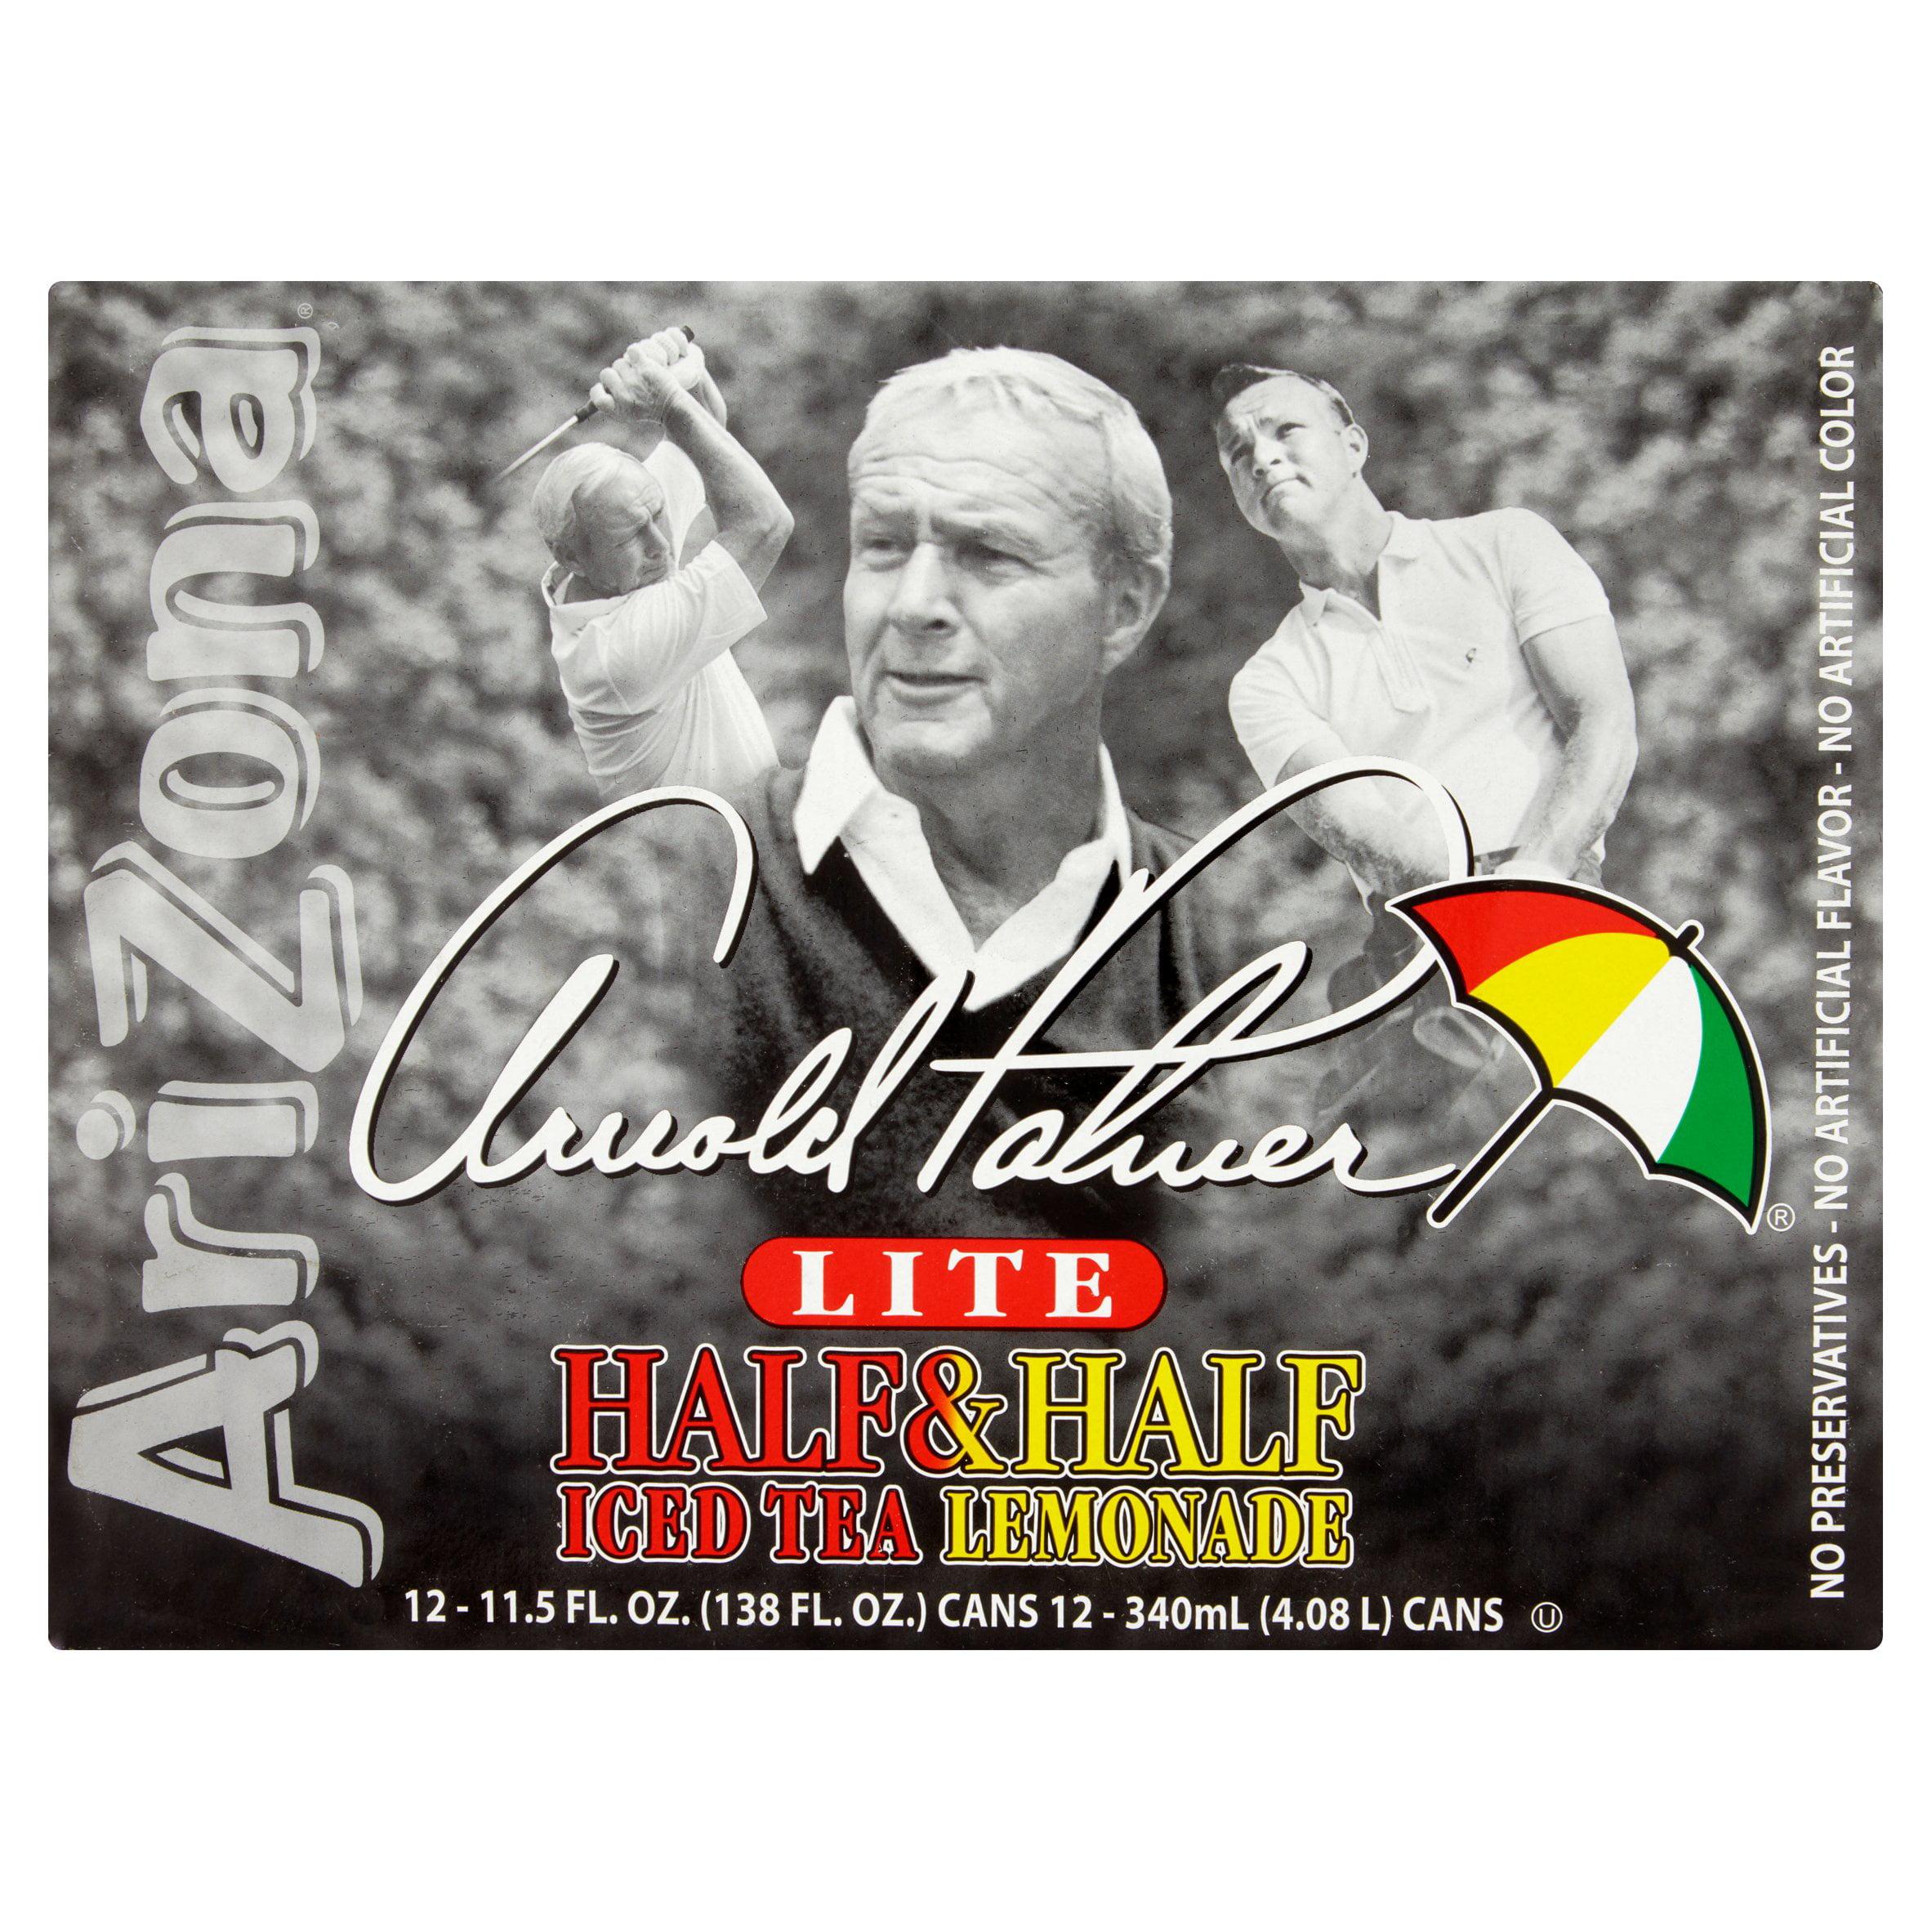 AriZona Arnold Palmer Half & Half Iced Tea Lemonade 12 PK, 138.0 FL OZ by Arizona Beverages USA LLC,